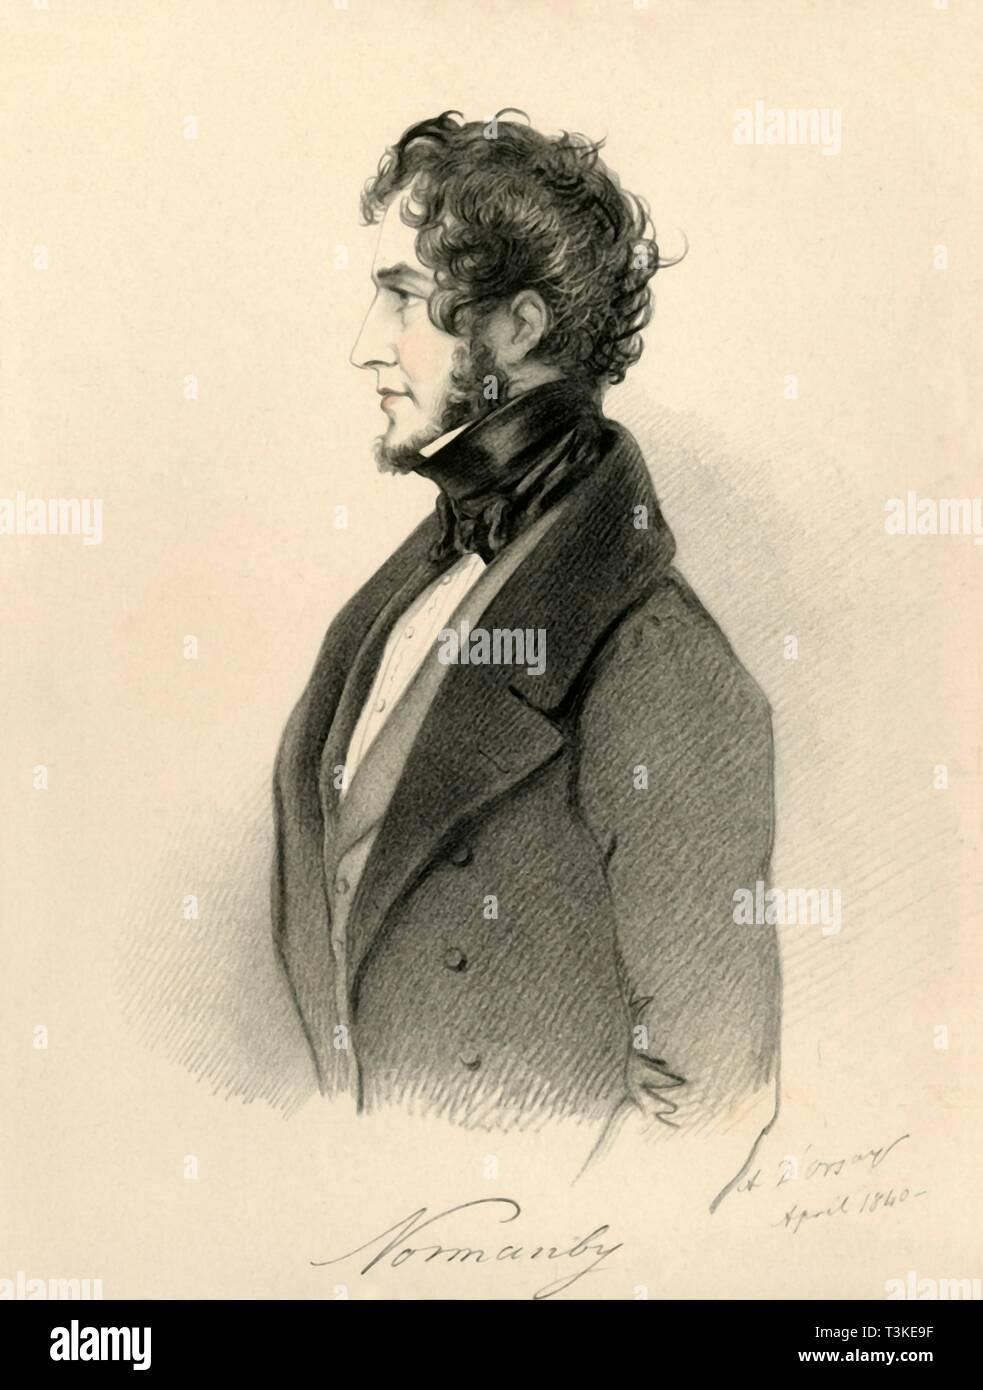 'Normanby', 1840. Creator: Richard James Lane. - Stock Image